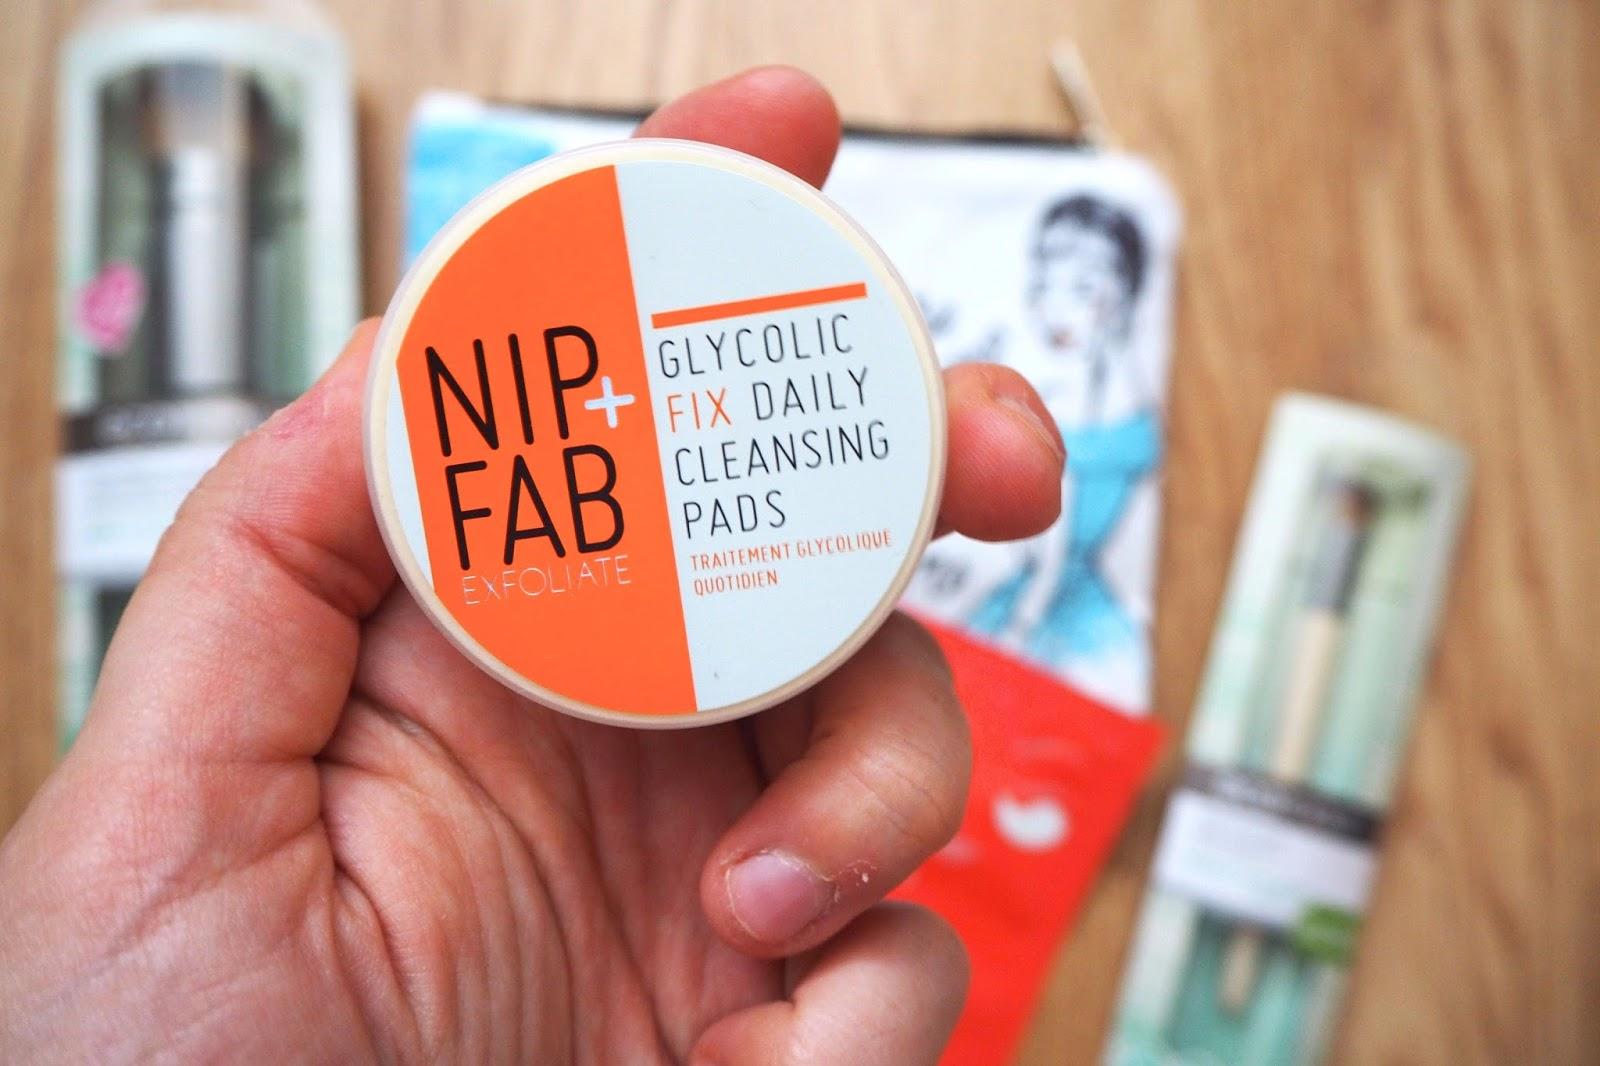 Nip & Fab Pads